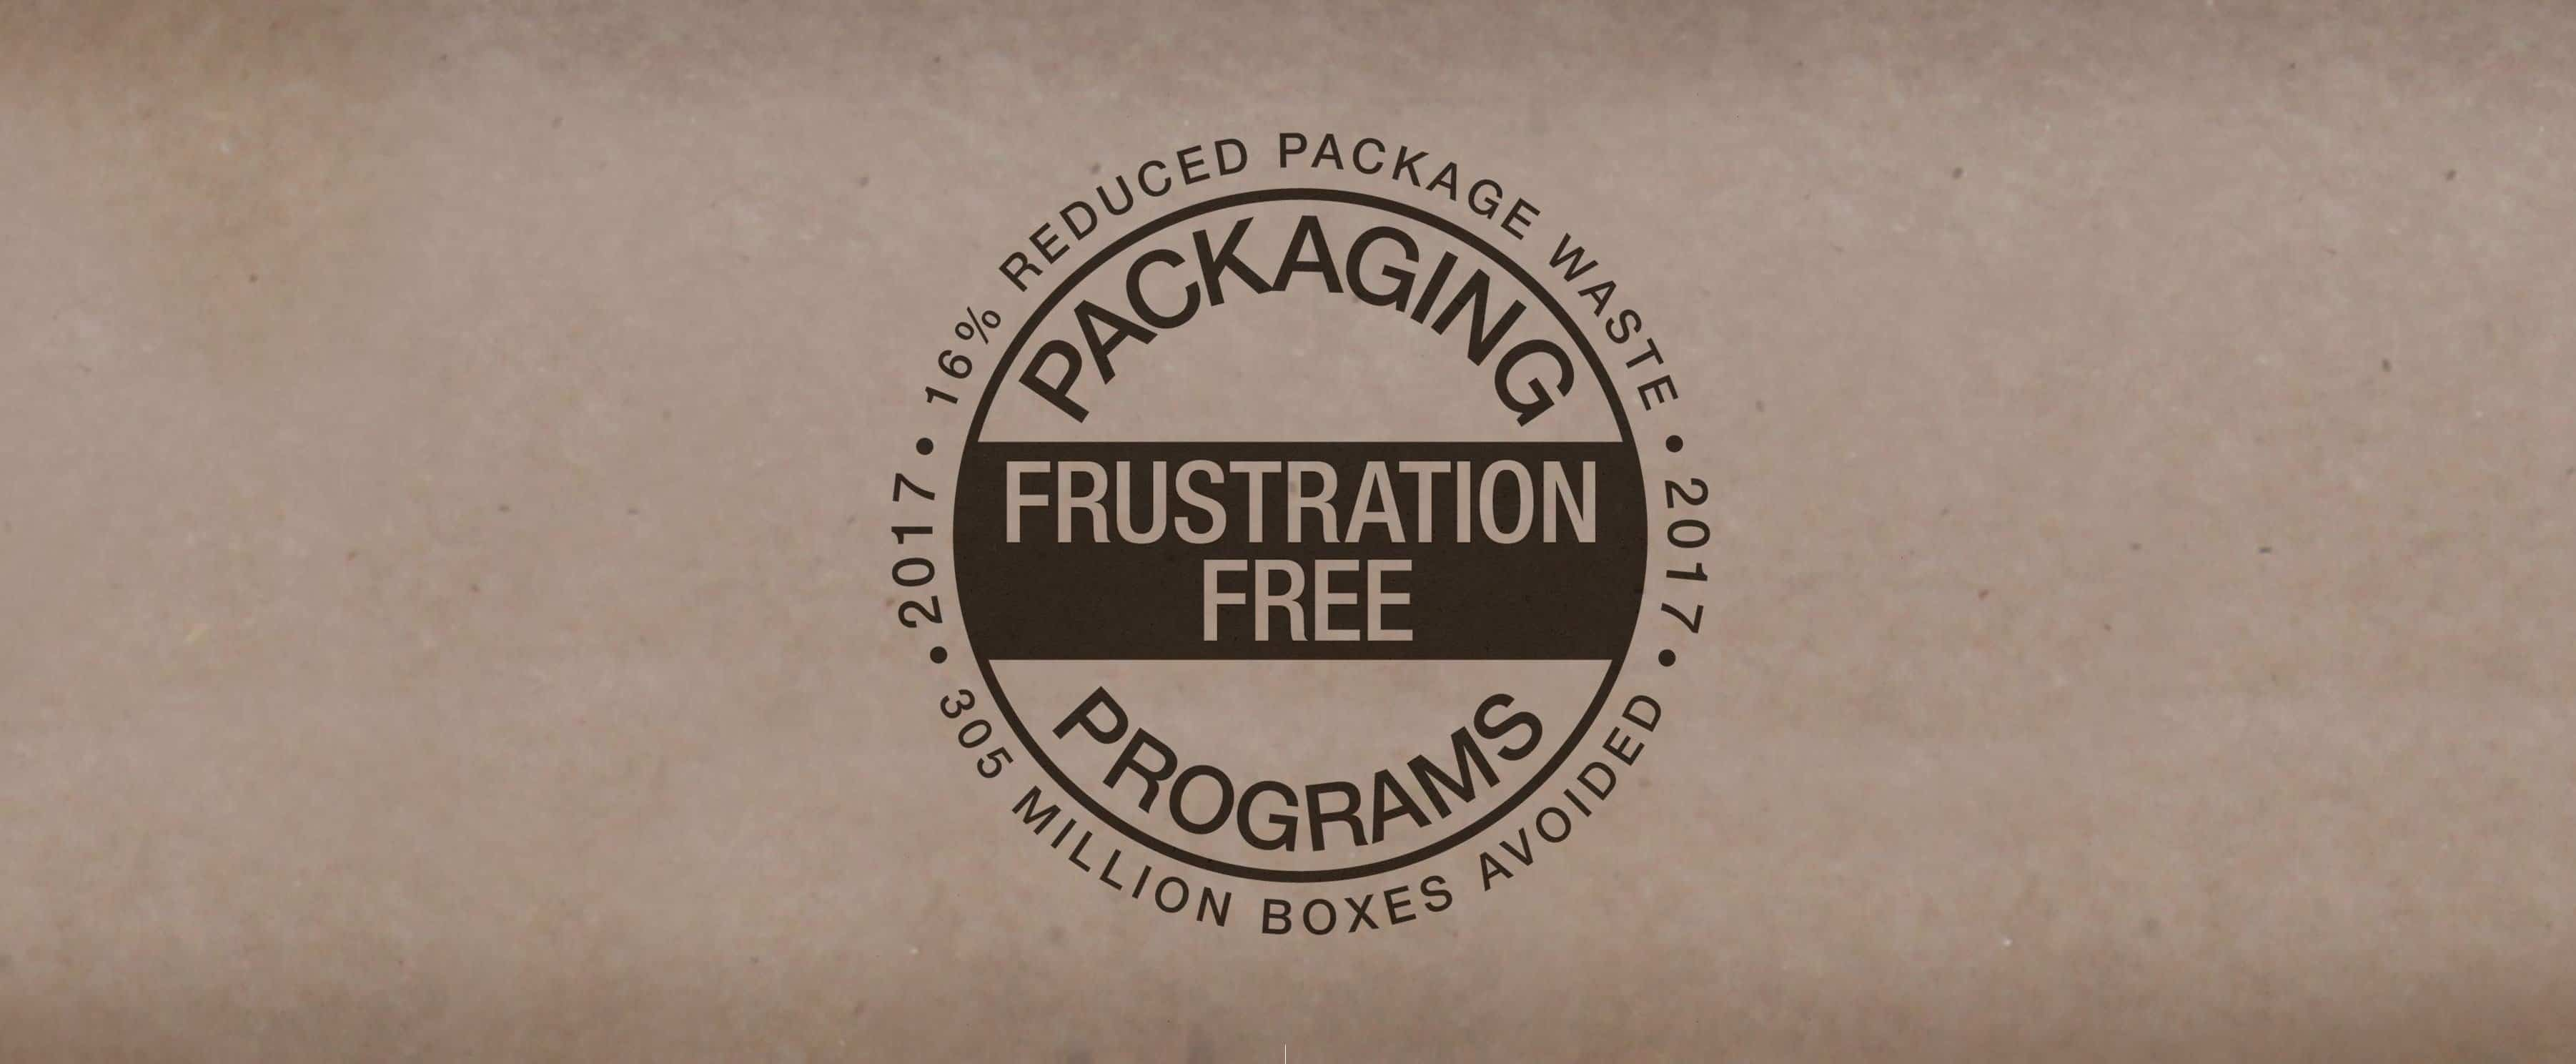 frustration free packaging logo